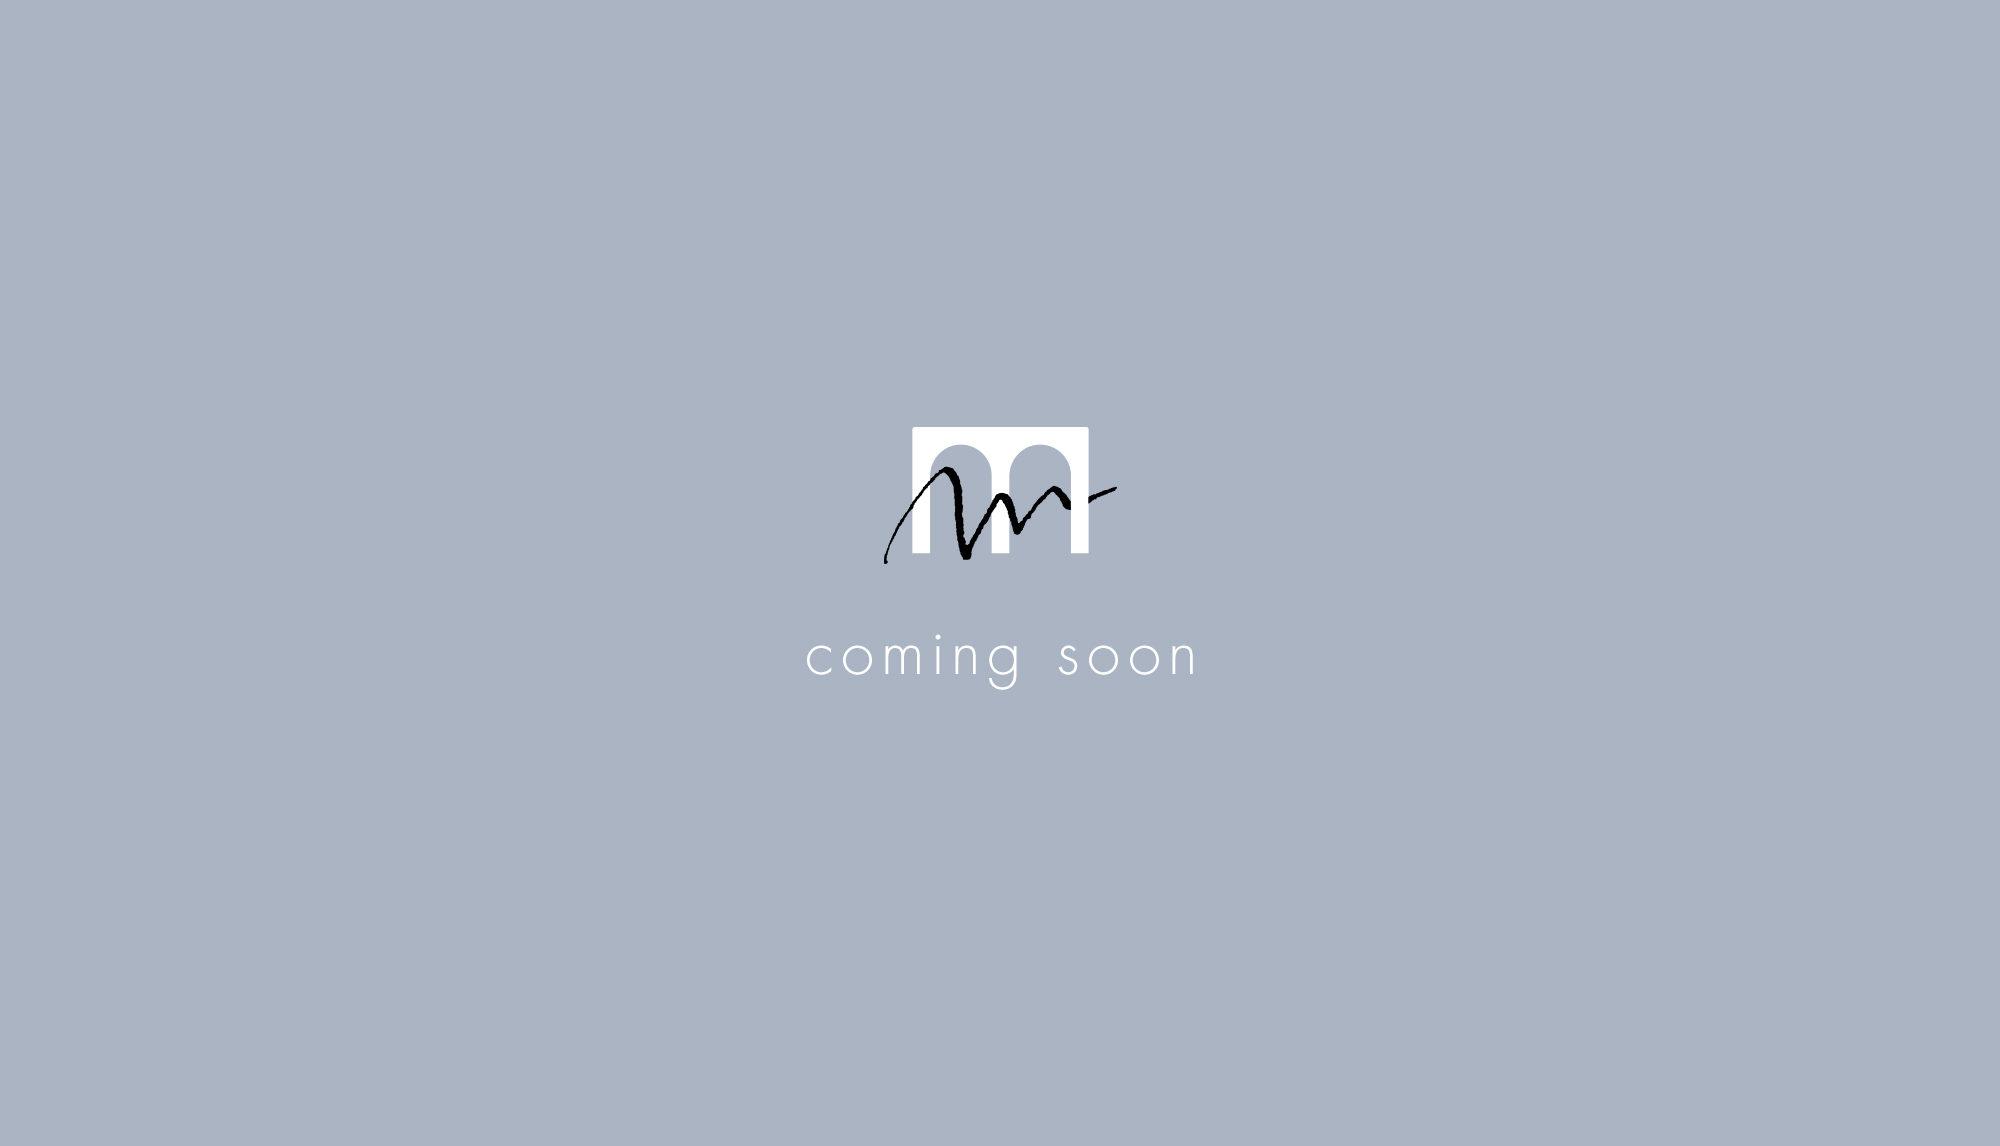 mamicosha_comingsoon